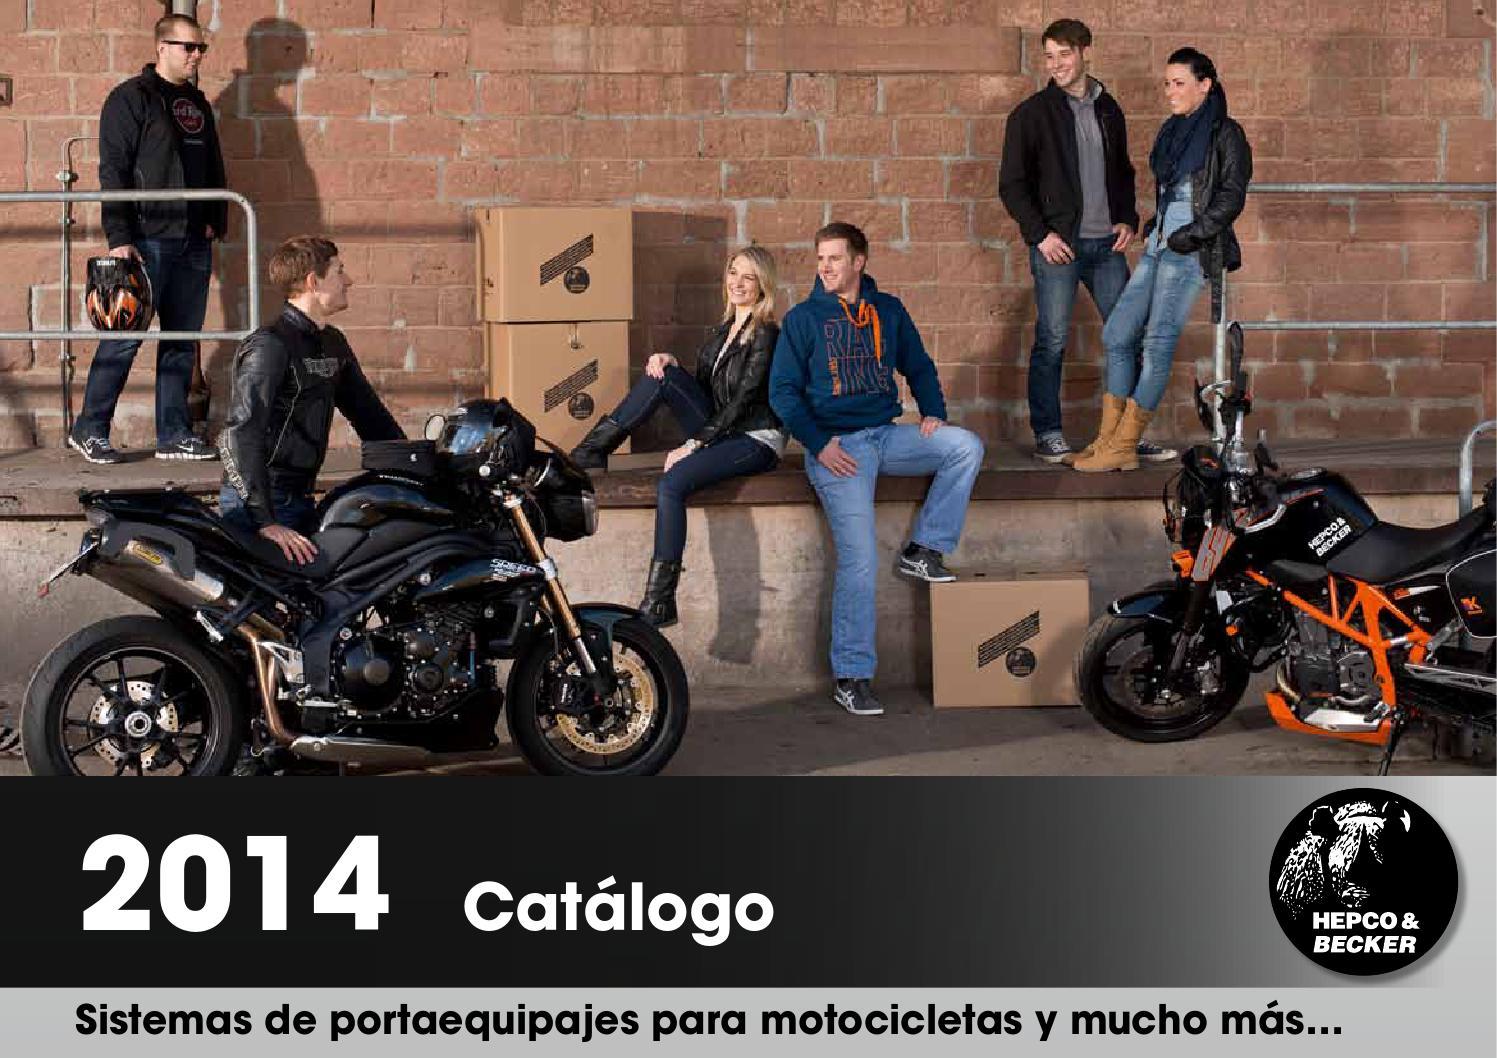 Catalogo hepco becker 2014 by puntomoto - issuu d4477b03ad65